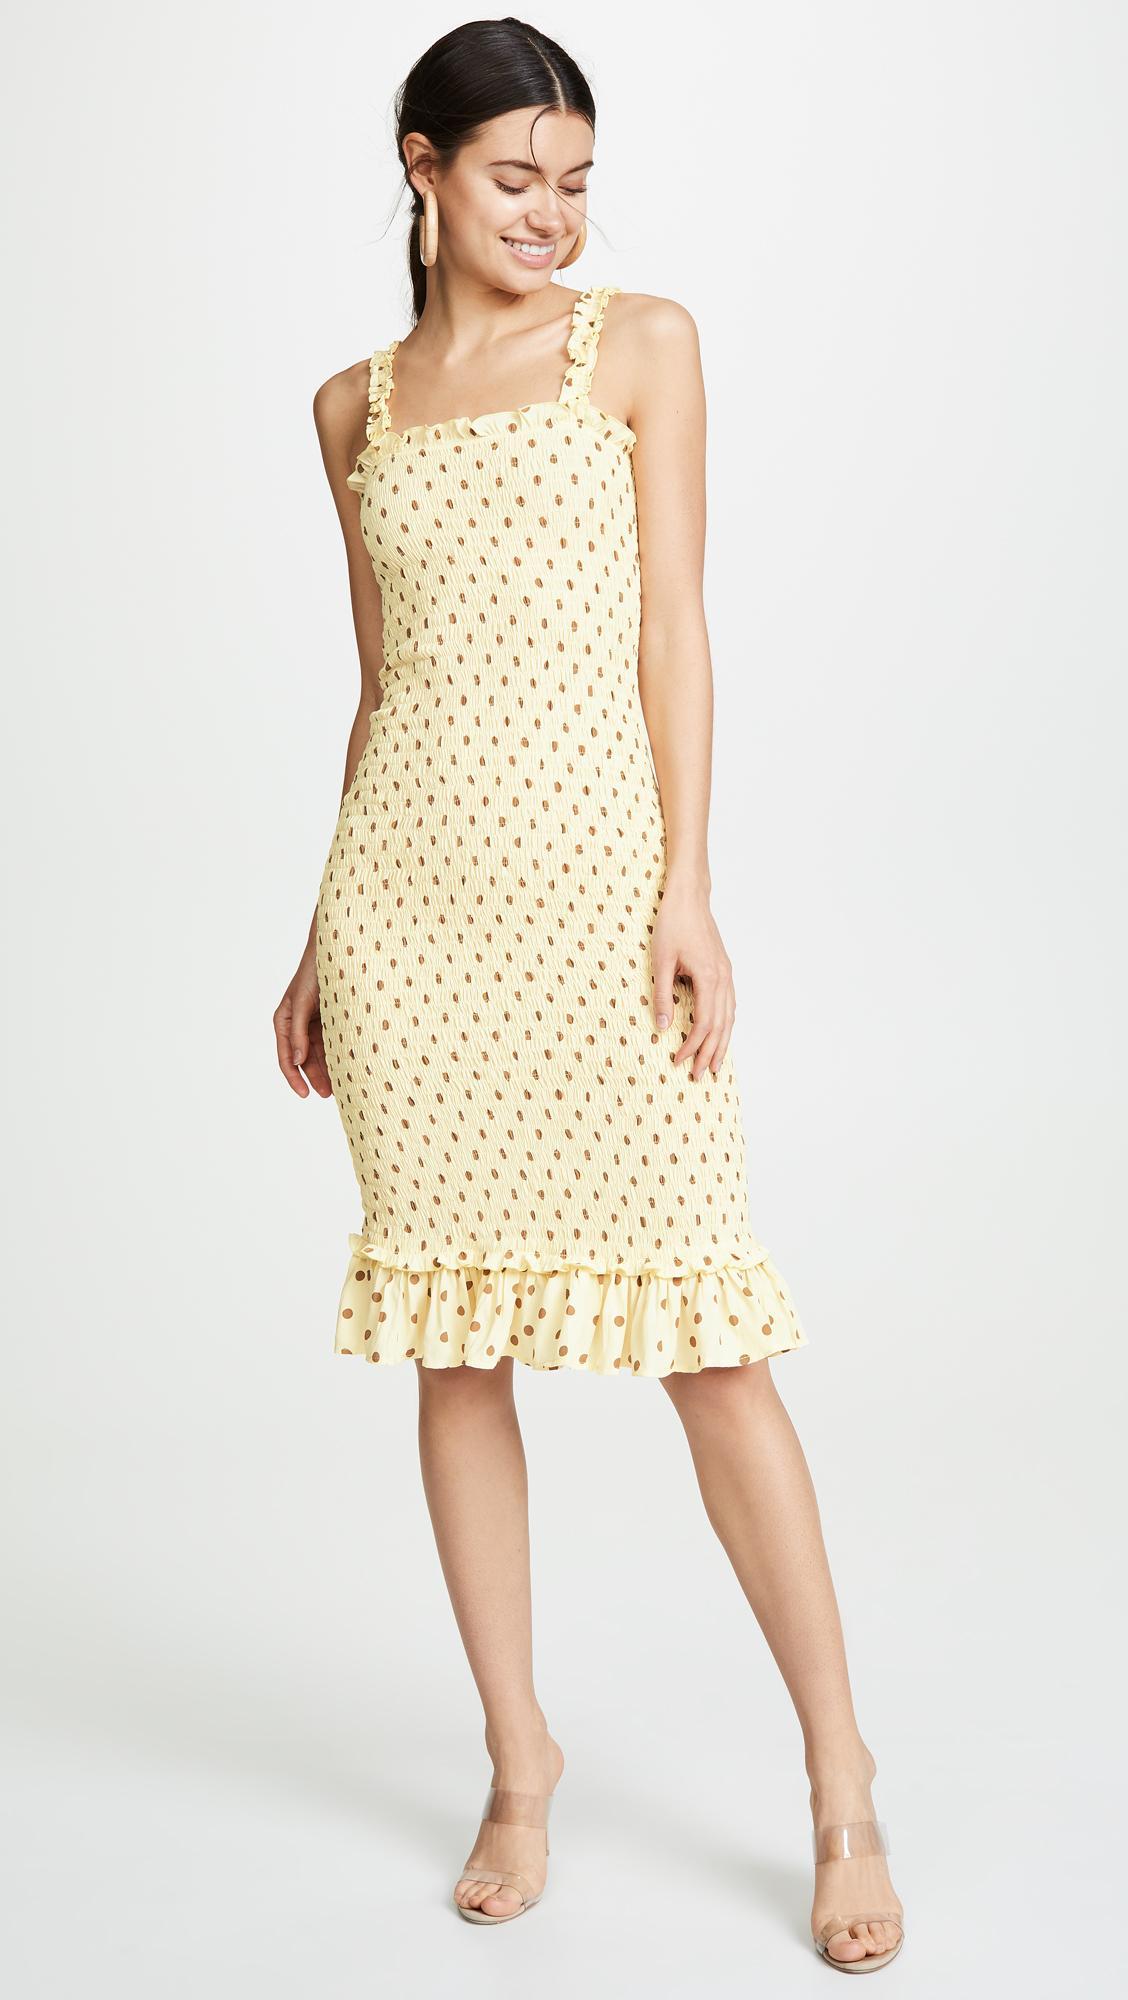 7d216843f7 Faithfull The Brand. Women s Faithfull Nadine Midi Dress